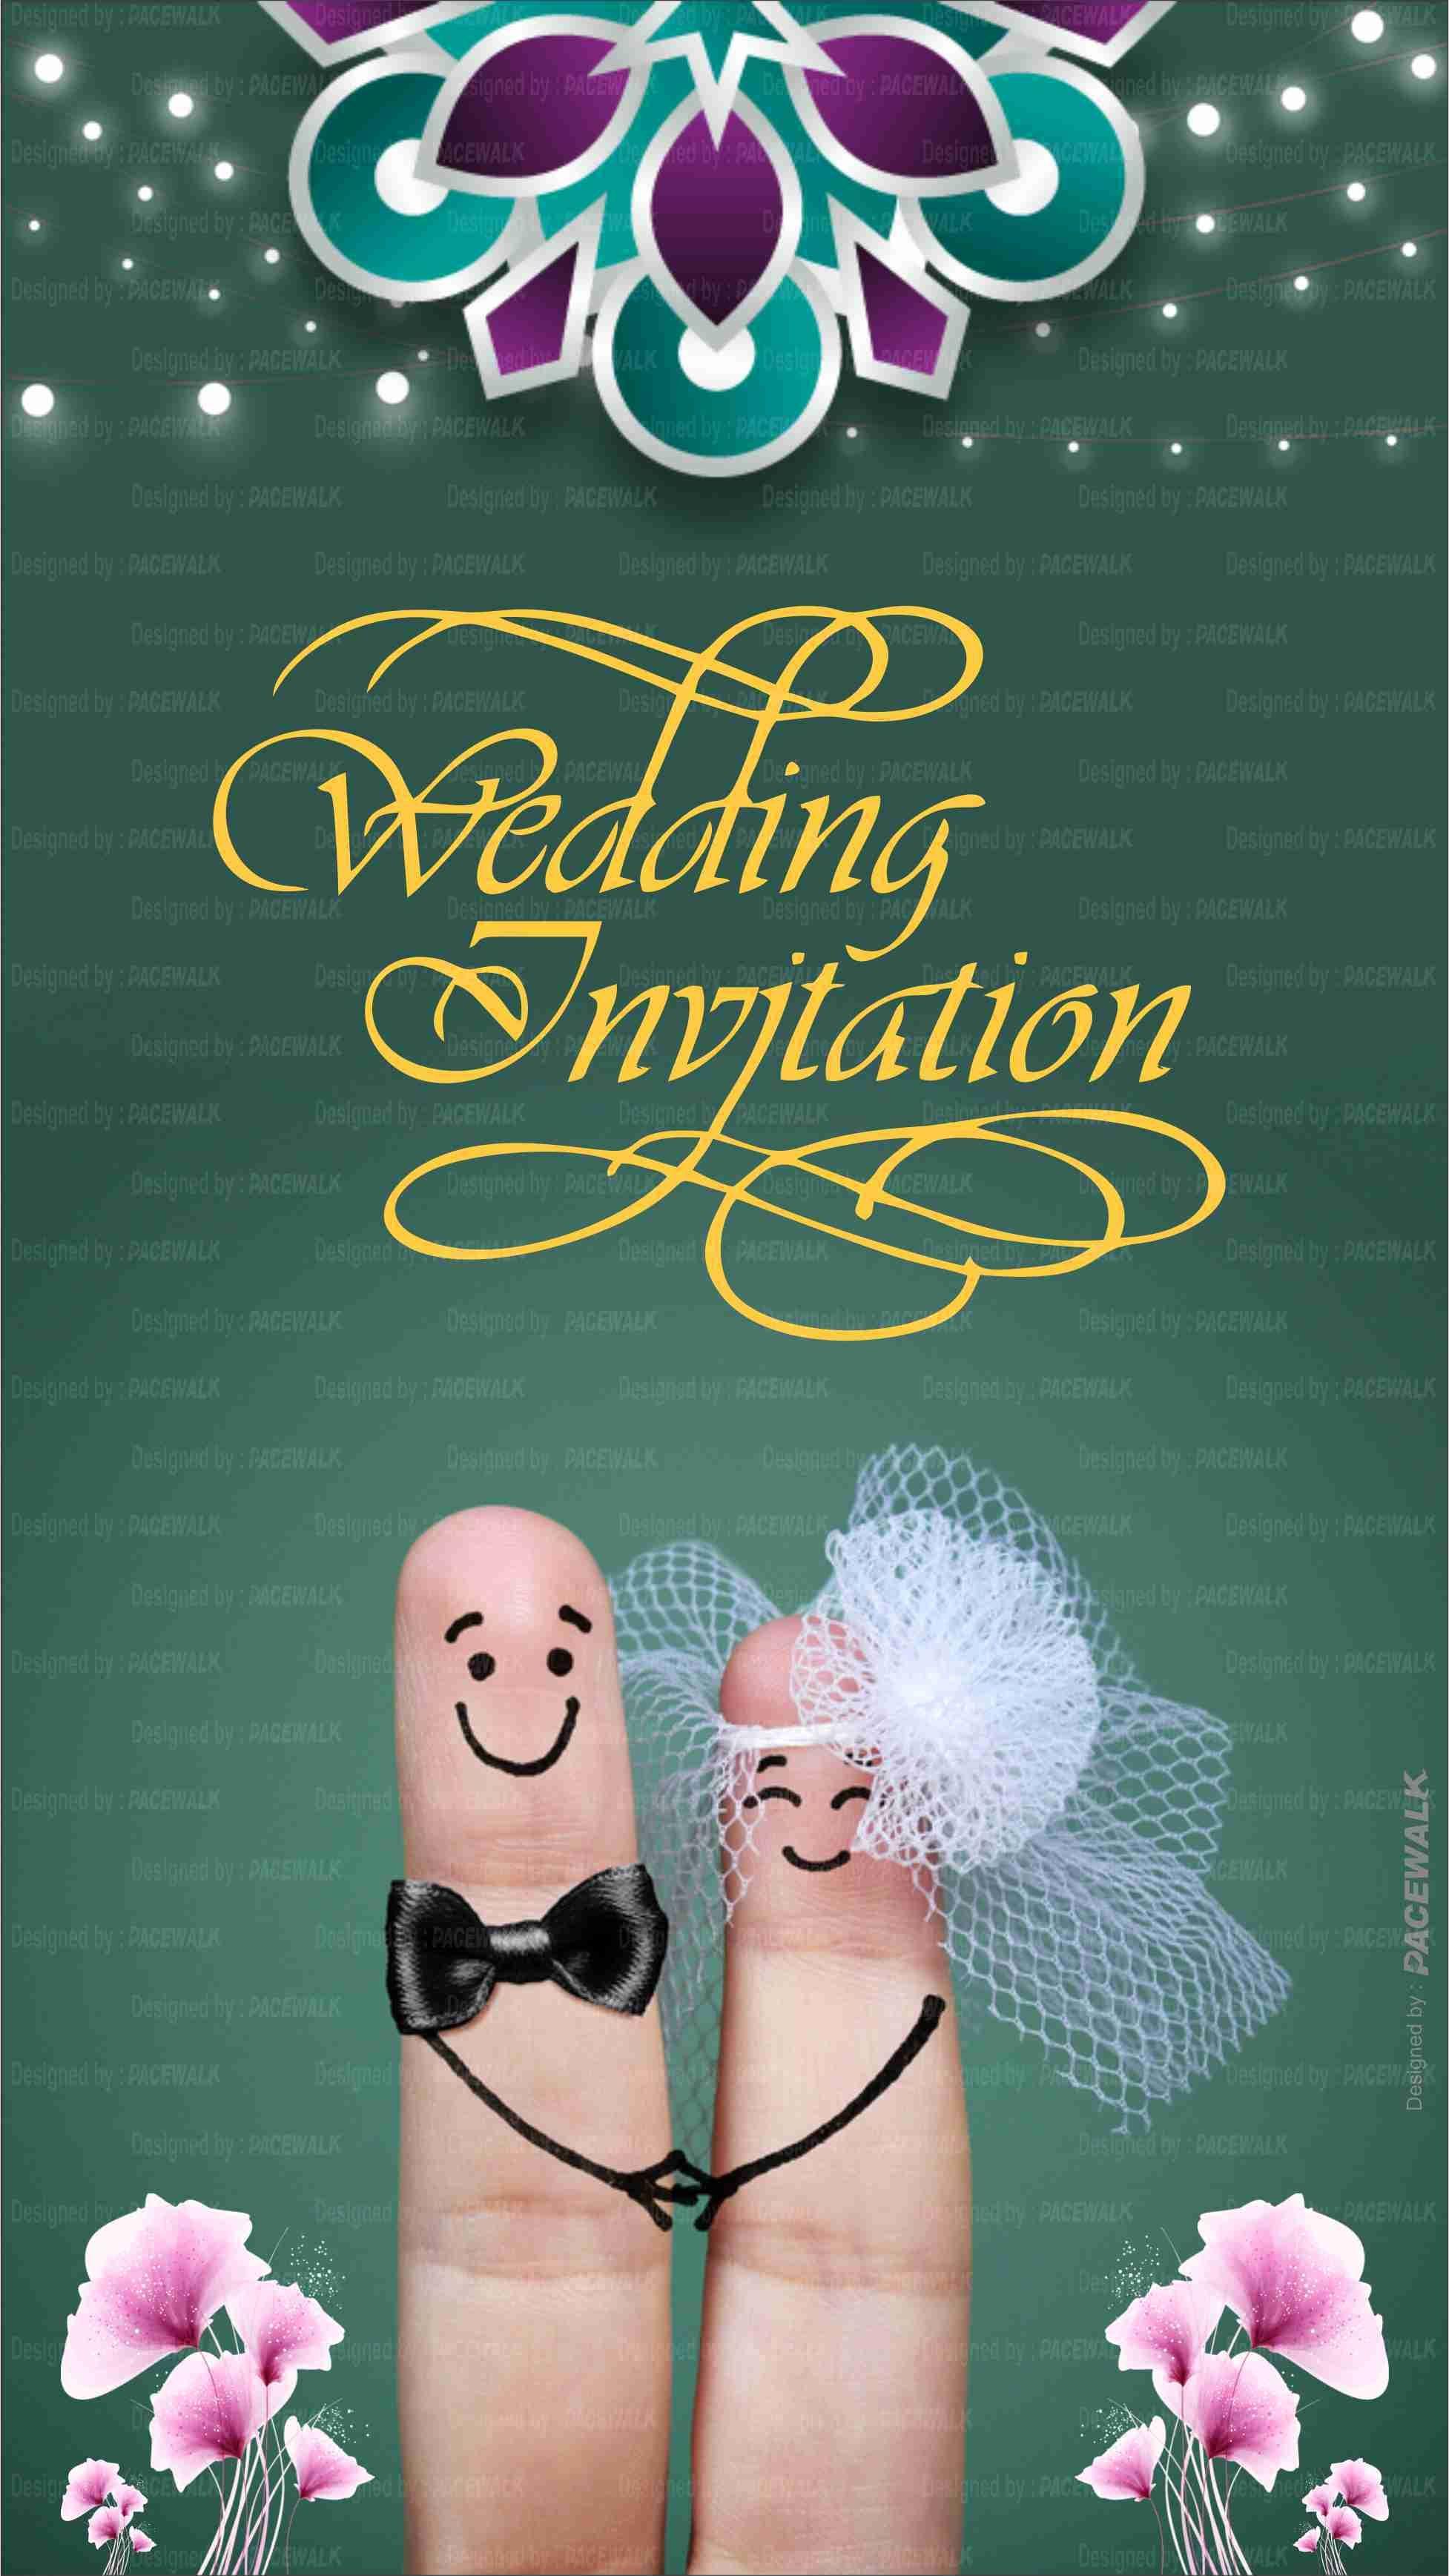 Customized Wedding Invitation Ecards